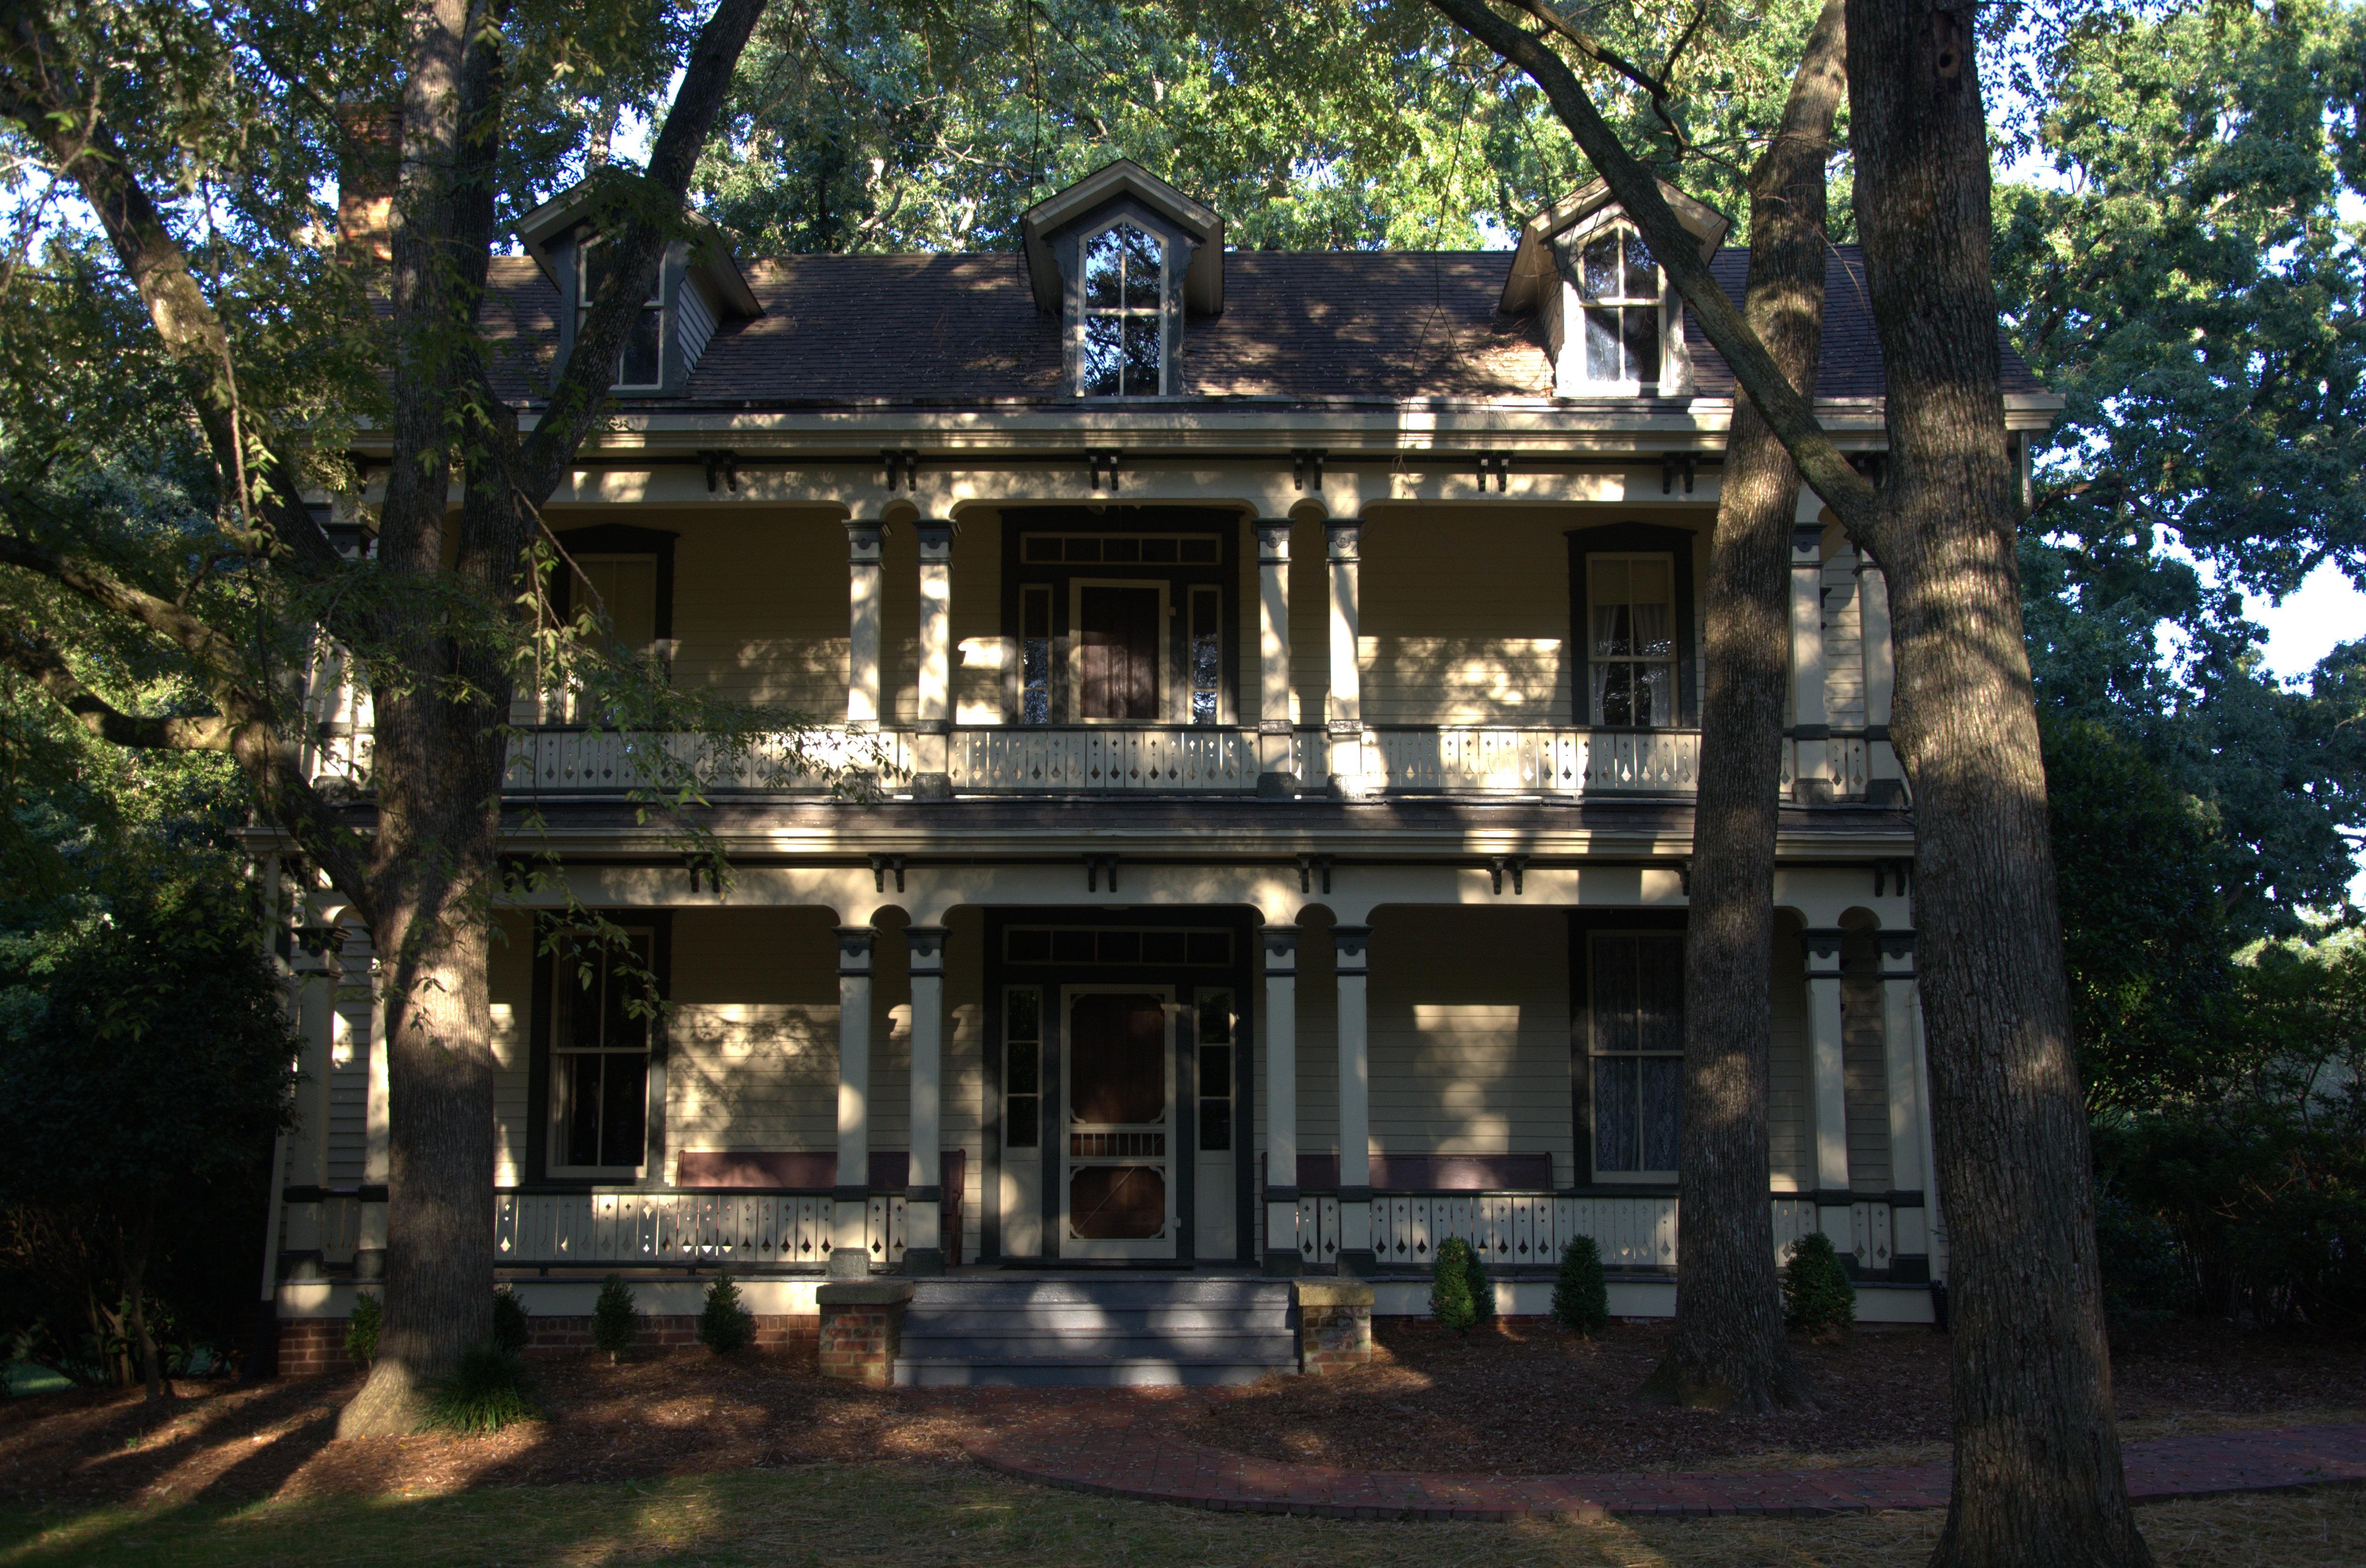 File:Shuford House Front, Hickory North Carolina.jpg ...